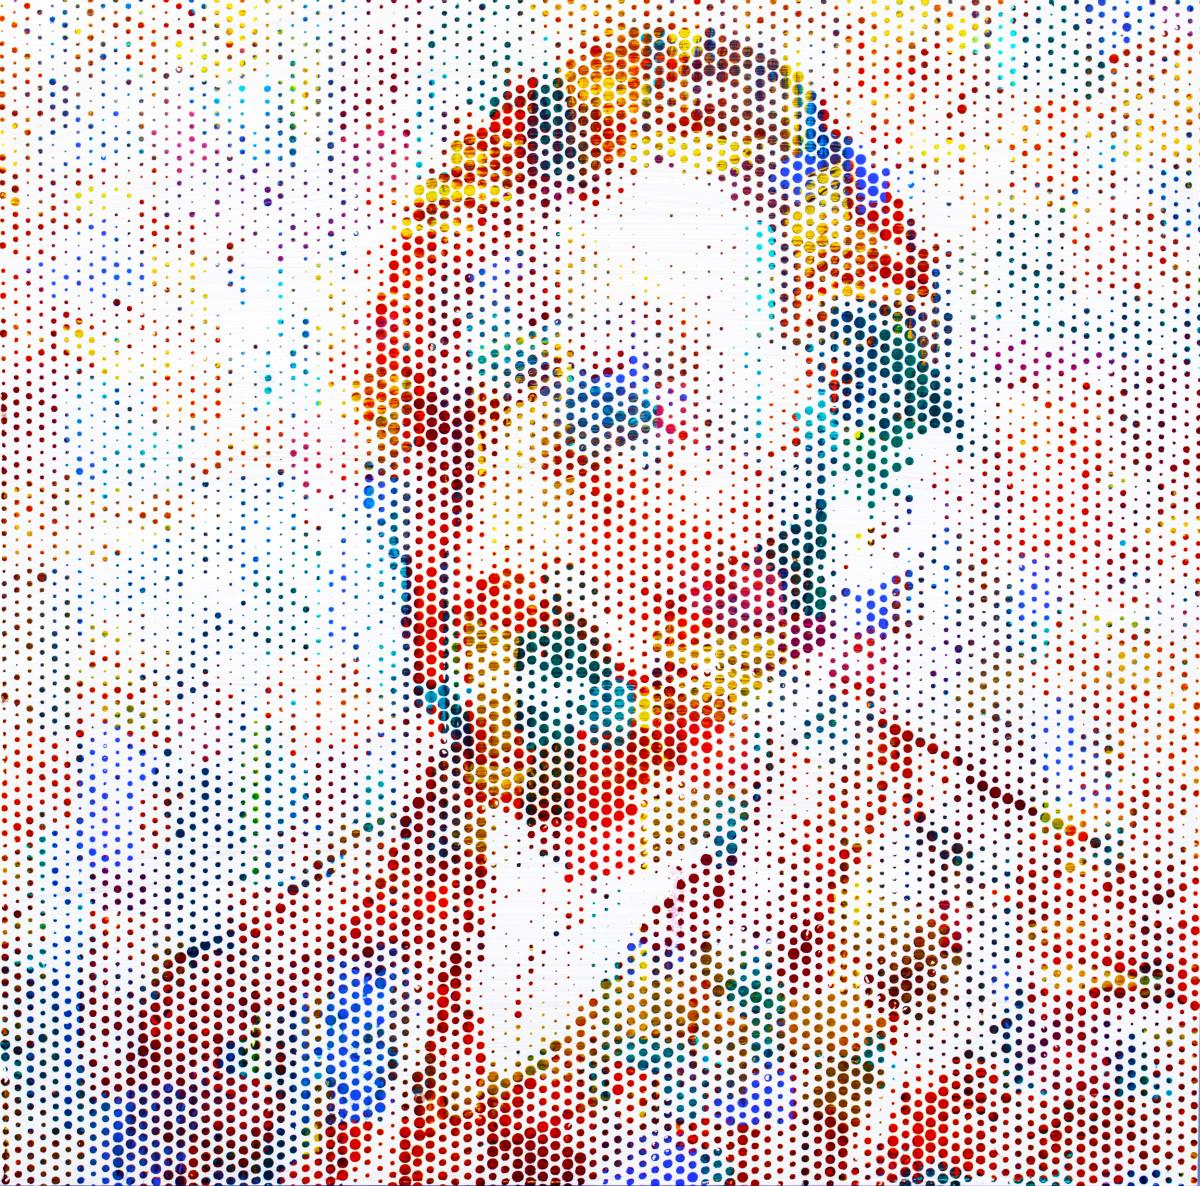 Vincent Van Gogh I by Sean Christopher Ward